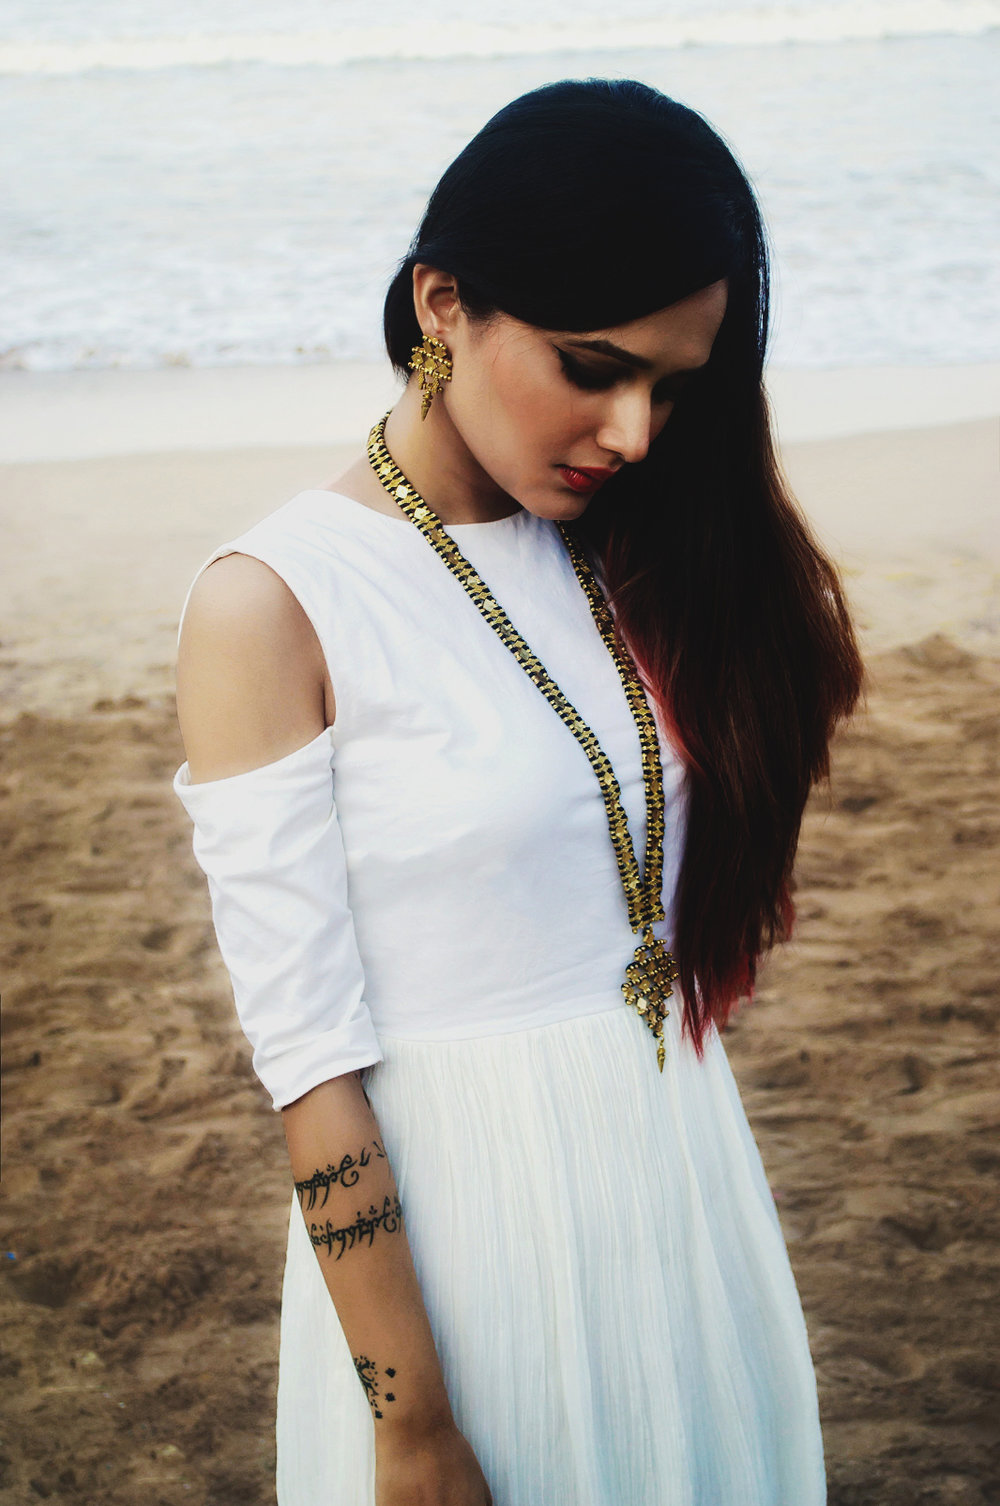 The-Chic-Armoire-by-Nidhi-Kunder-Samatvam--House-of-Tuhina-3